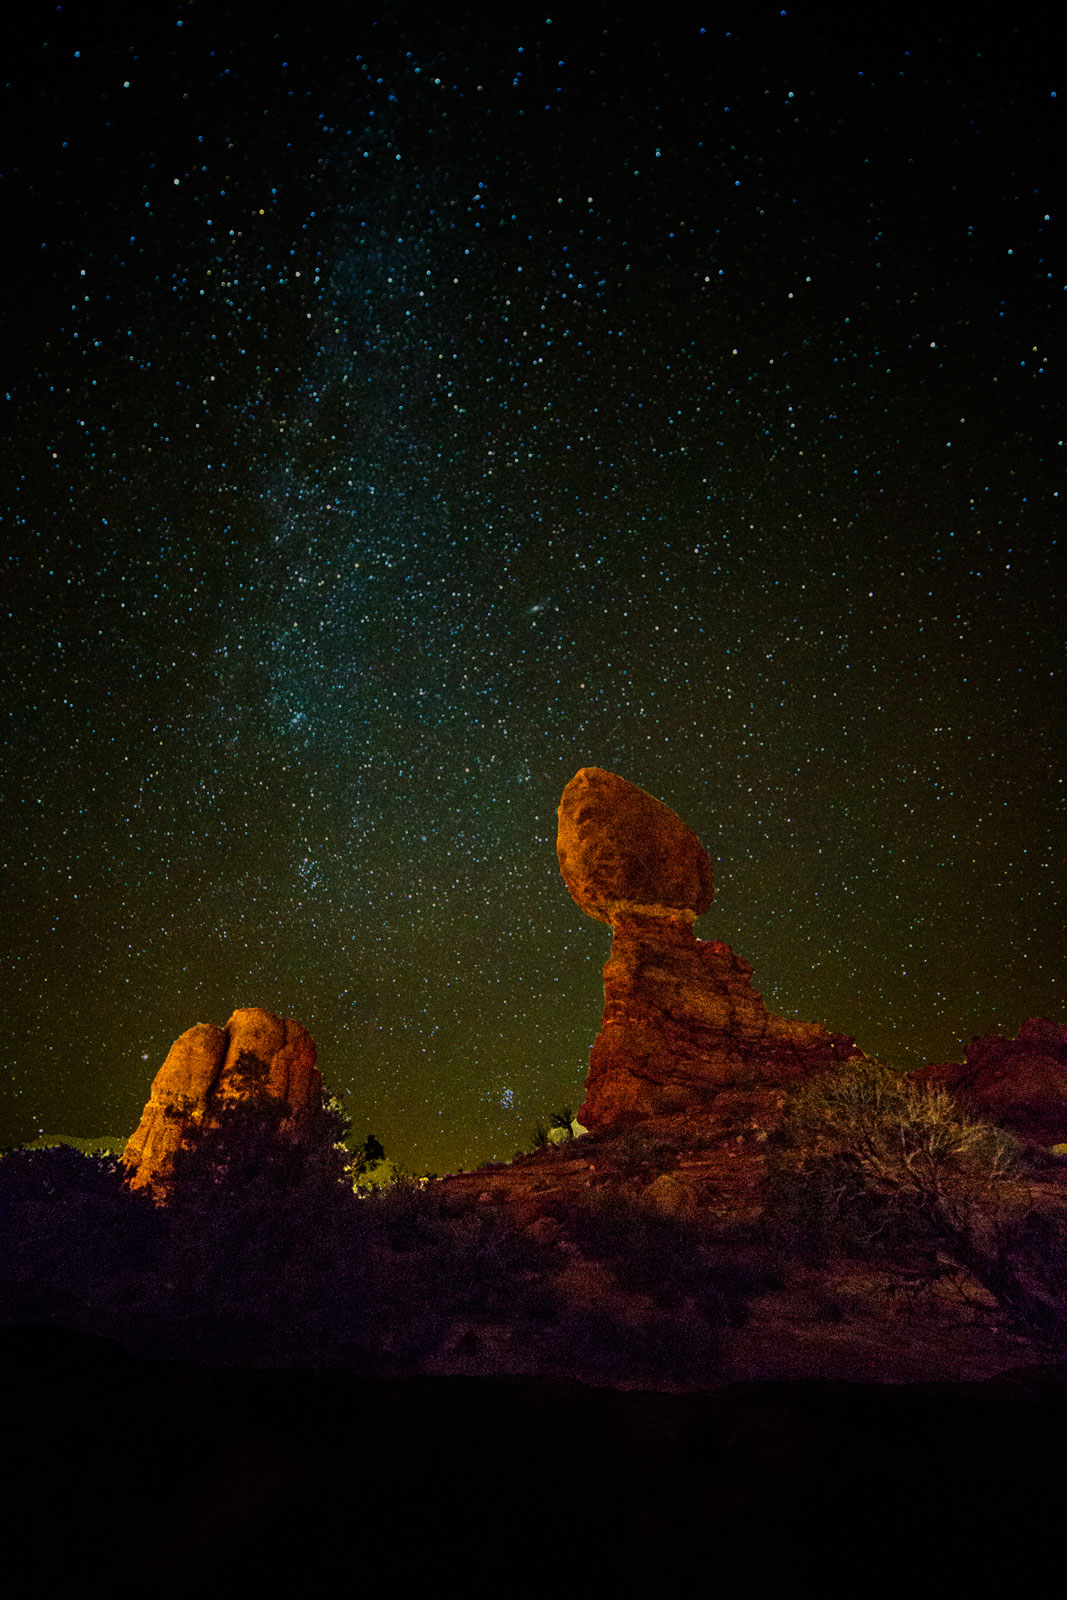 Night Sky Over Balanced Rock